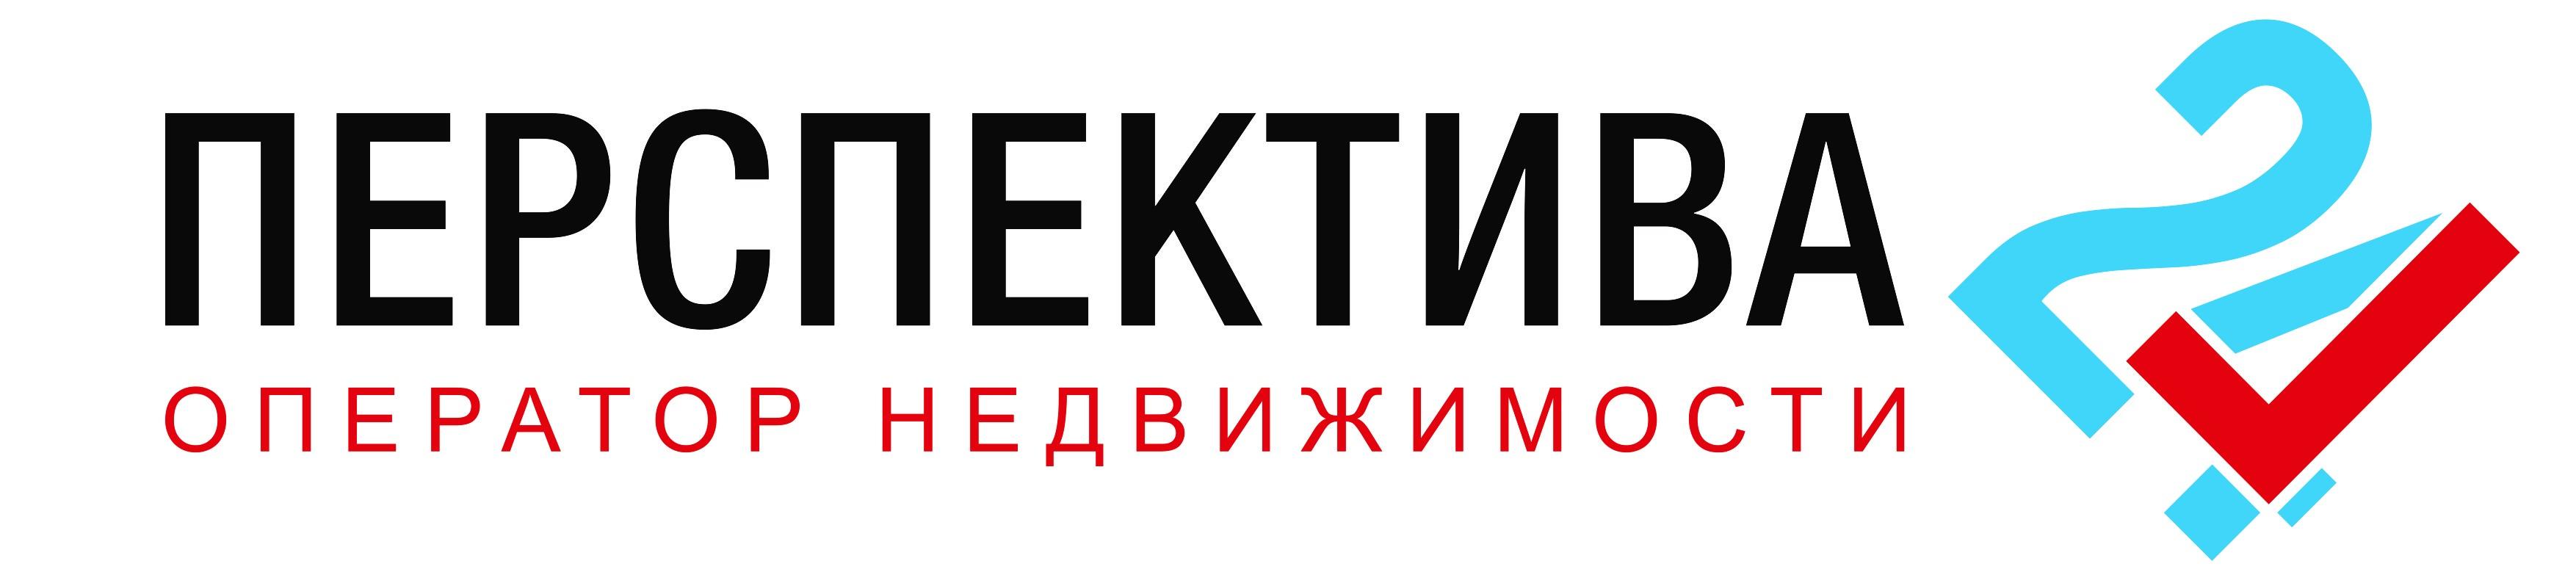 Оператор недвижимости ПЕРСПЕКТИВА 24, ,  Казань